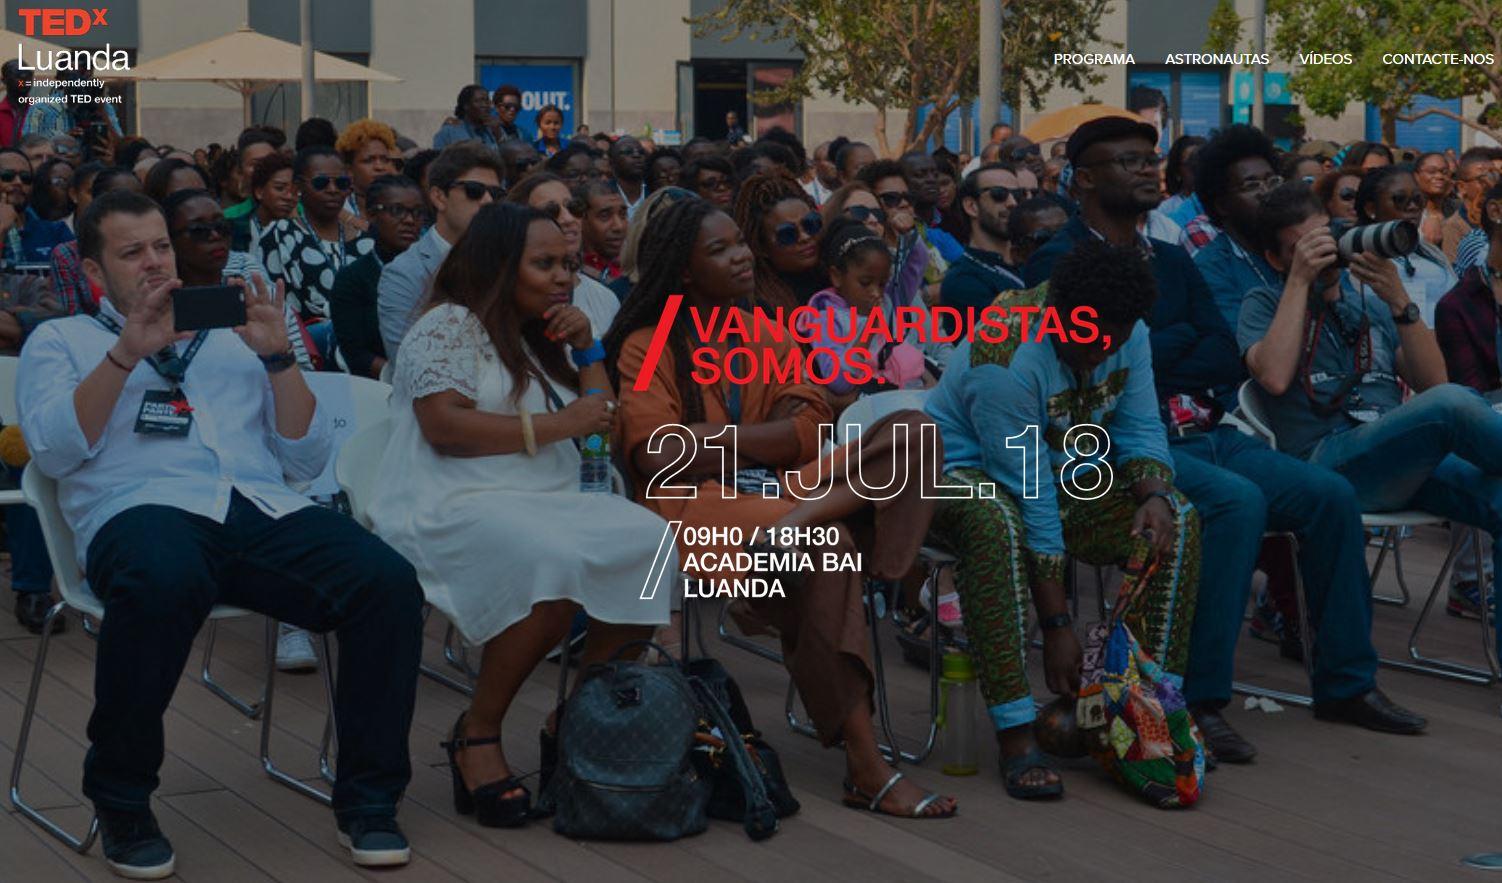 TEDxLuanda 2018